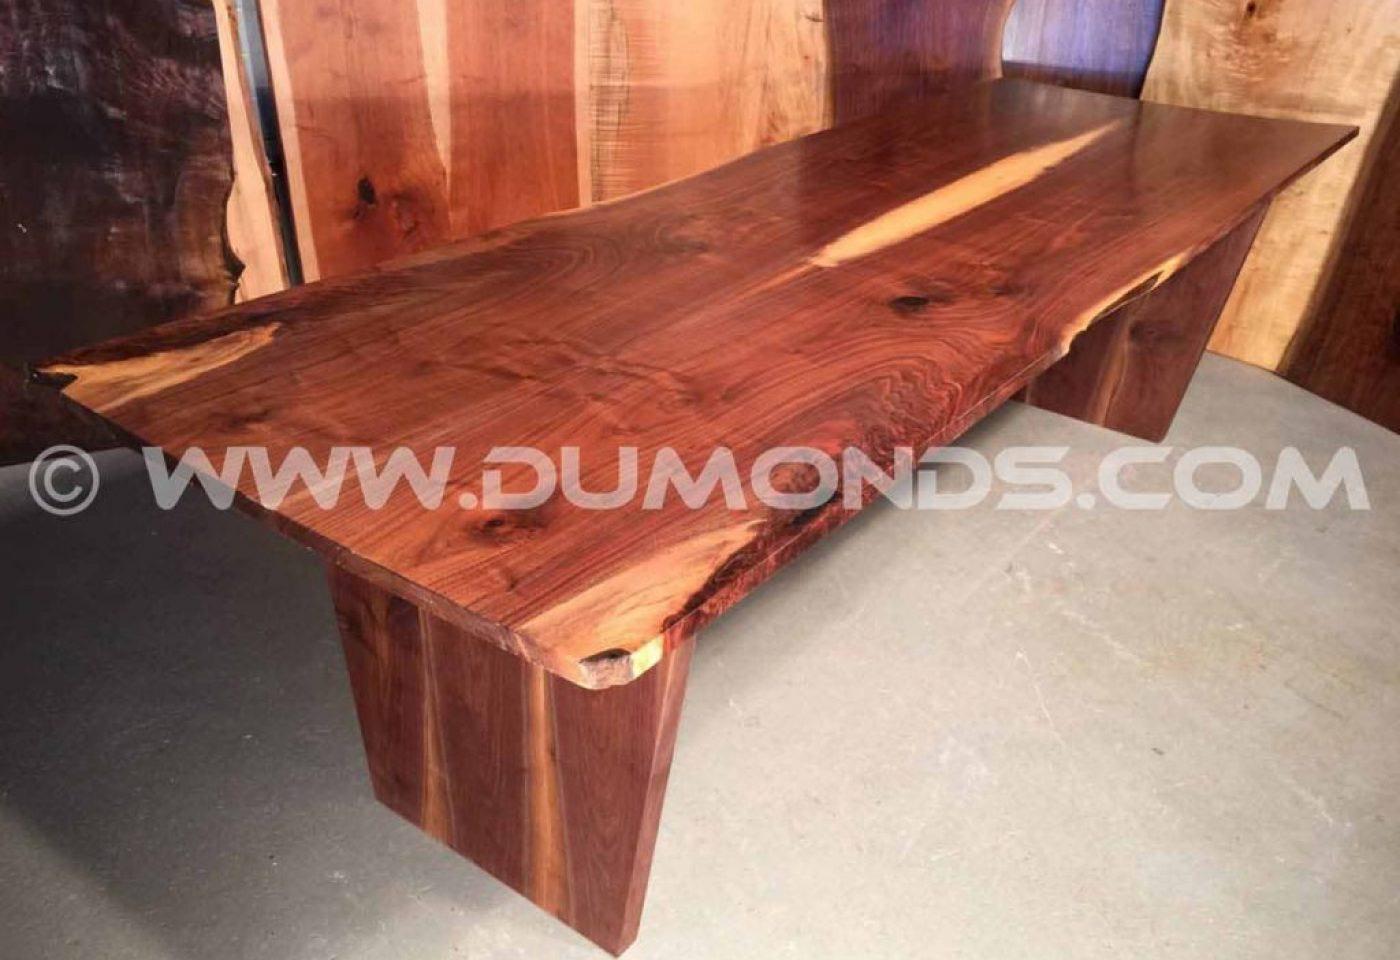 URBAN RECYCLED MARYLAND WALNUT LIVE EDGE SLAB TABLE